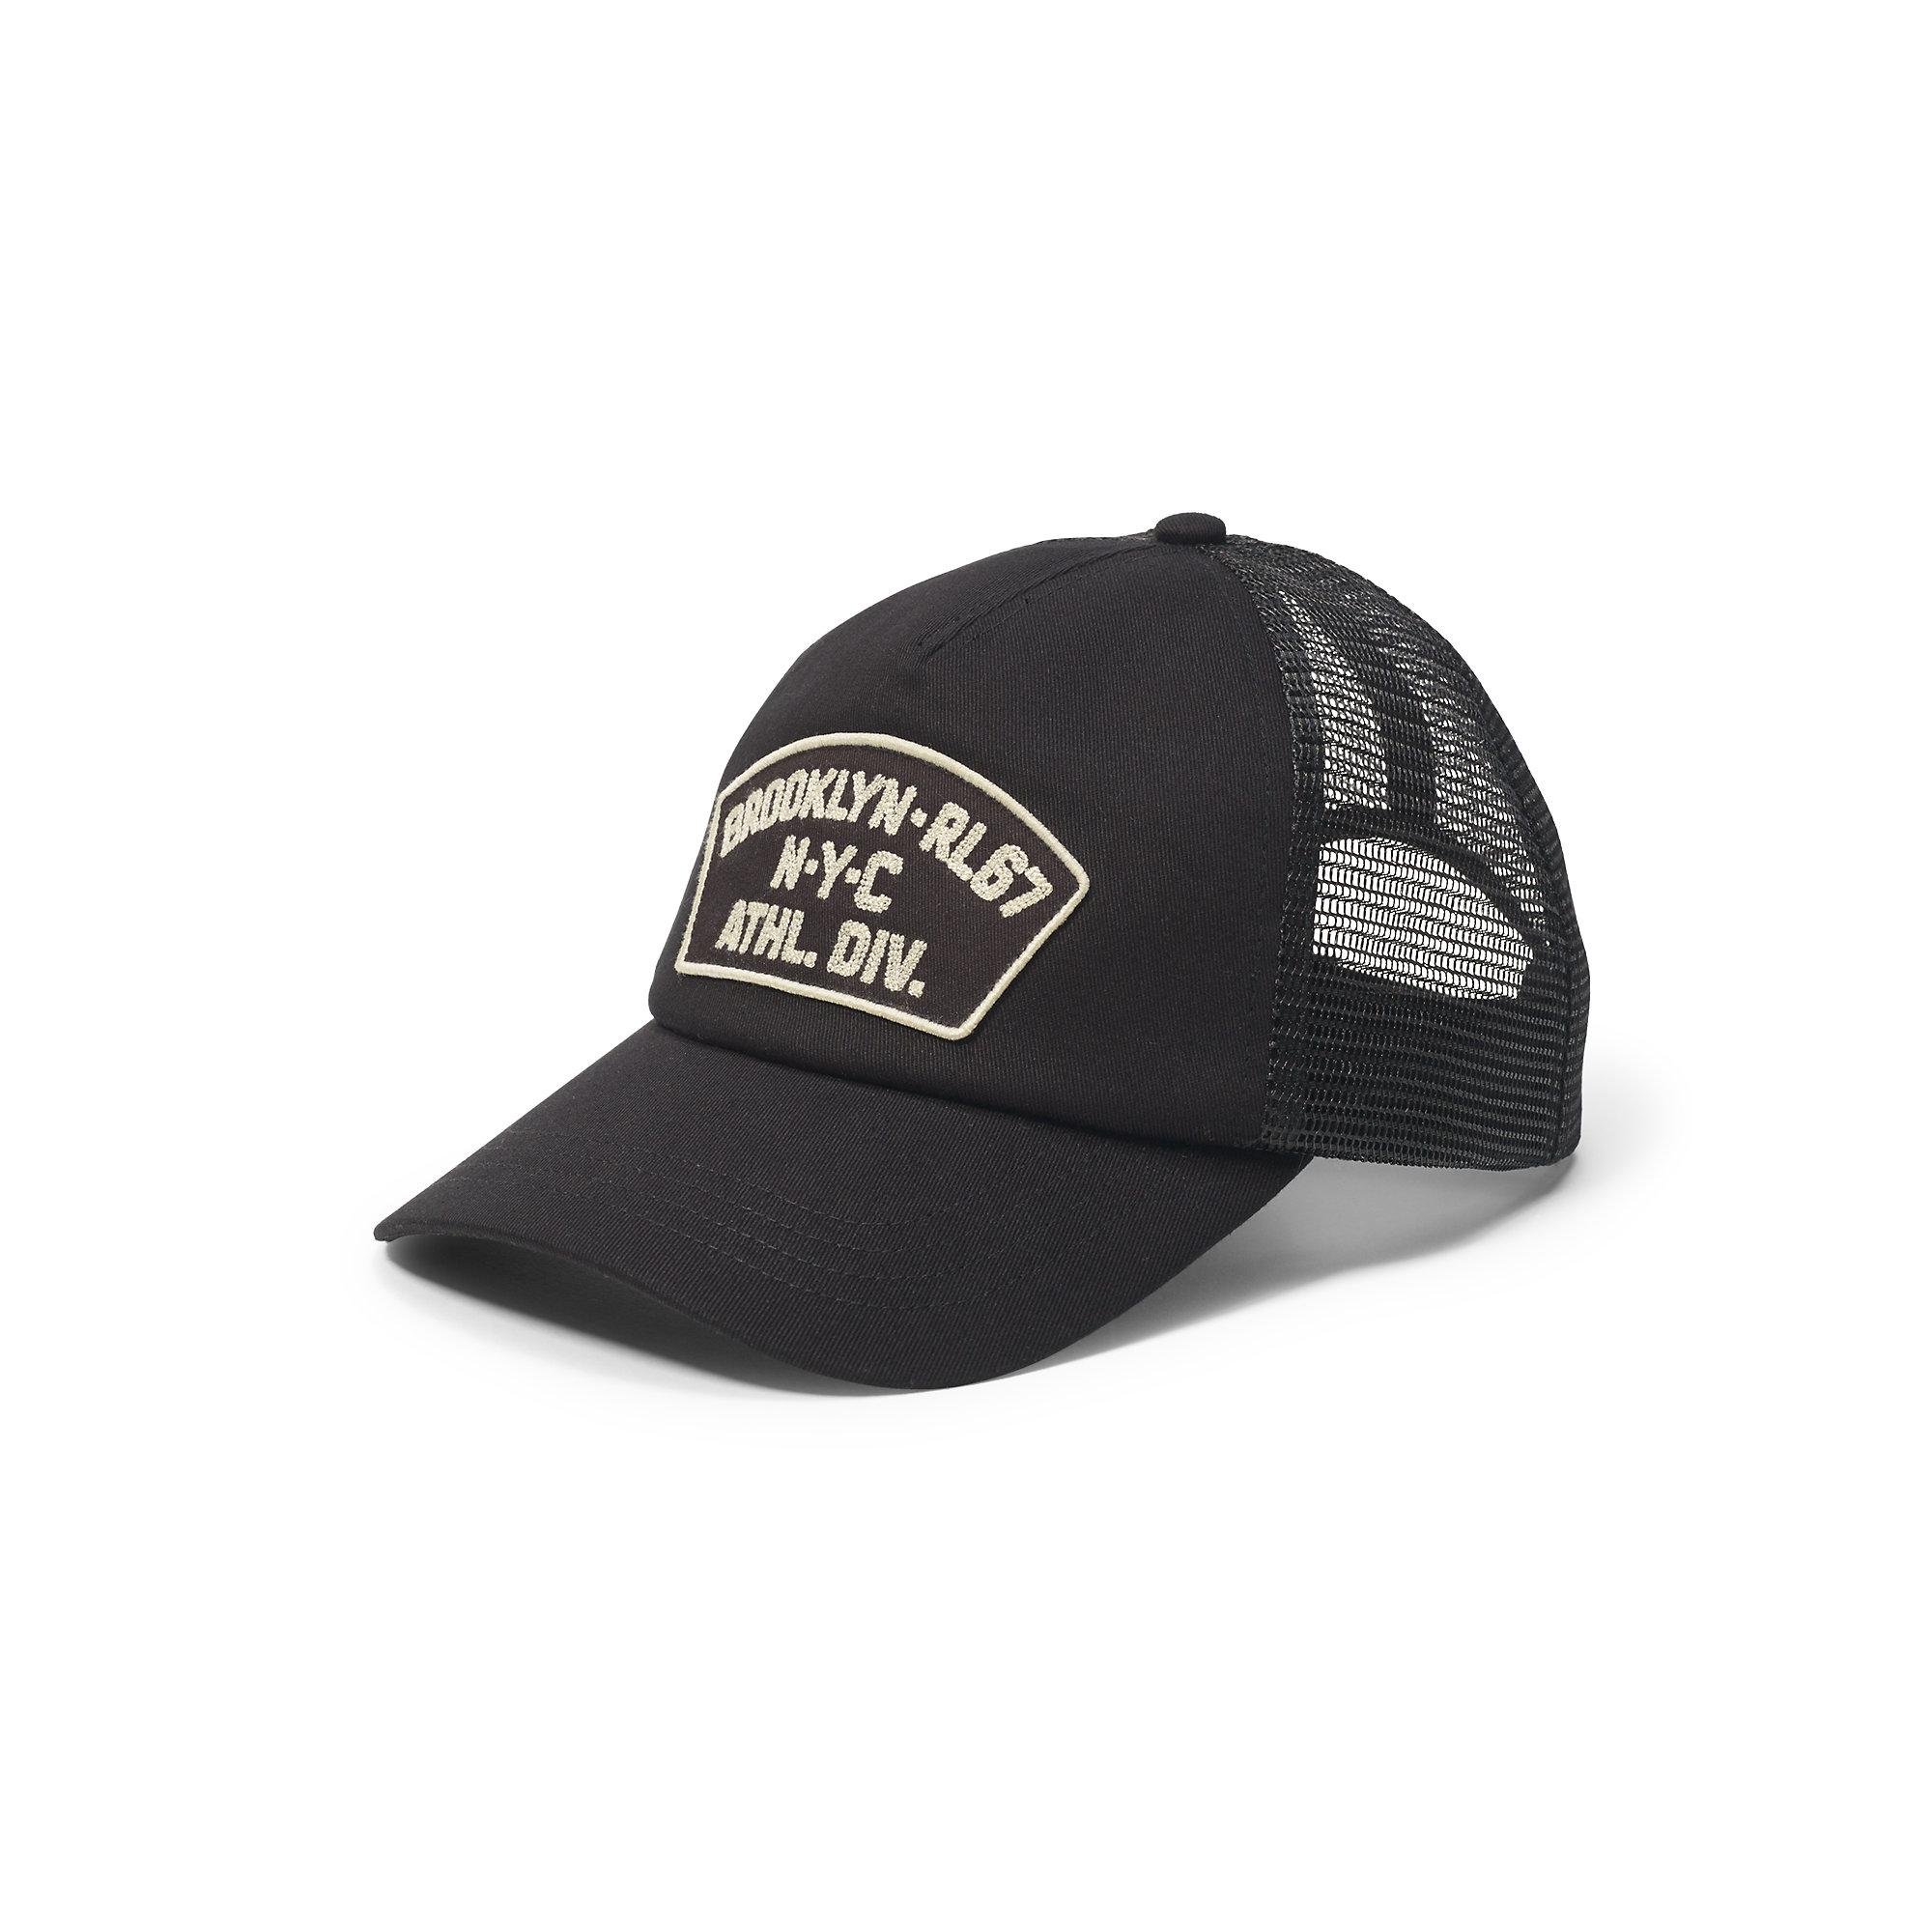 Lyst - Polo Ralph Lauren Utility Mesh Trucker Hat in Black for Men 941143c04b9